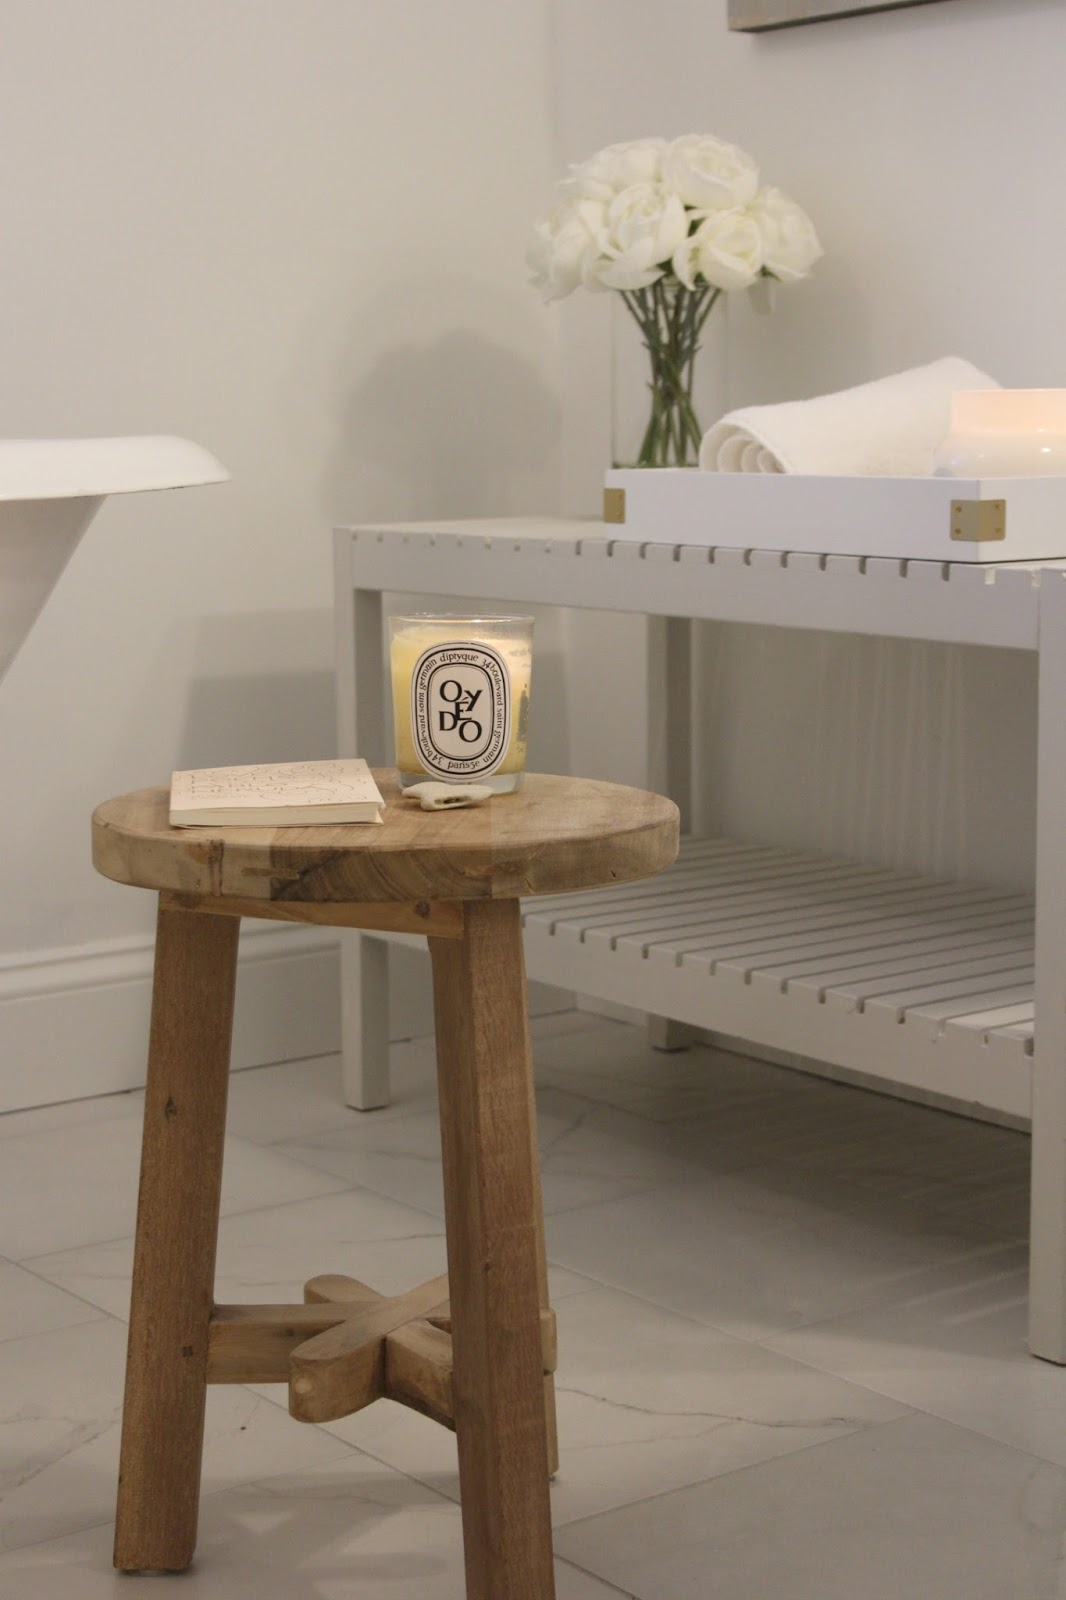 Rustic three leg teak stool in modern farmhouse style bathroom by Hello Lovely Studio